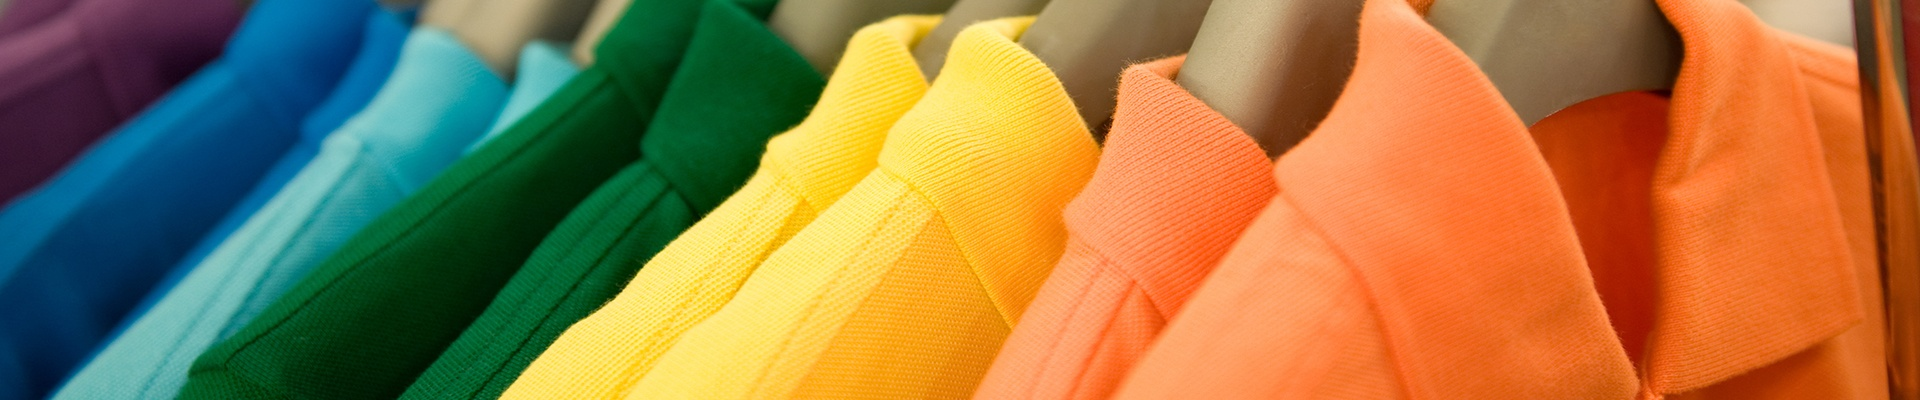 company-uniform-corporate-apparel.jpg